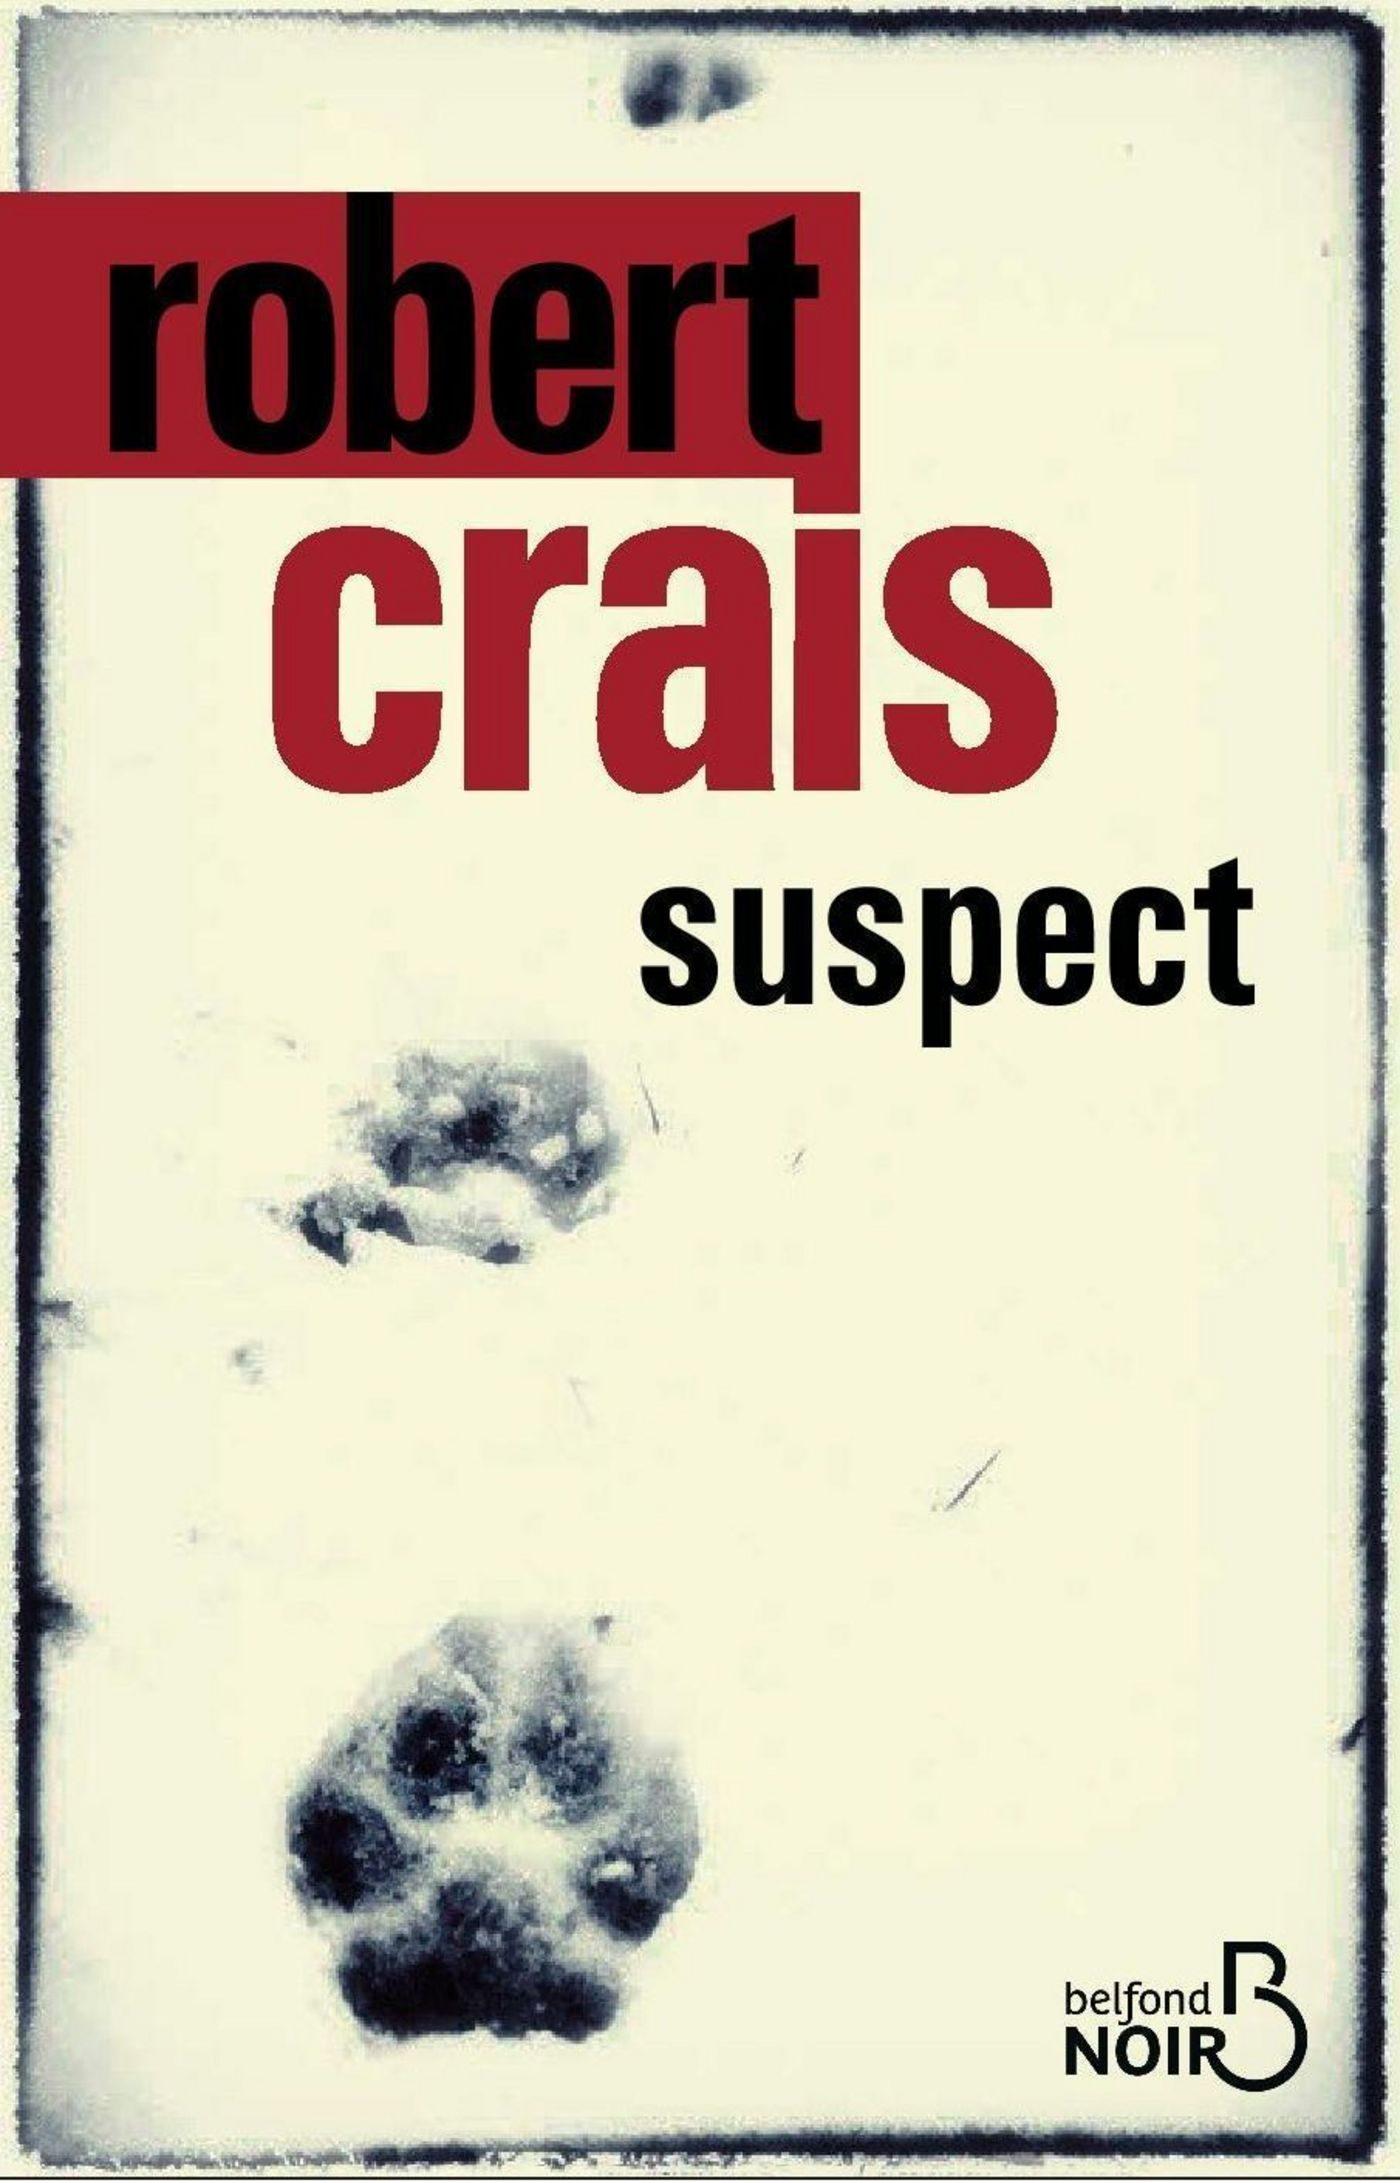 Robert Crais Suspect Ebook